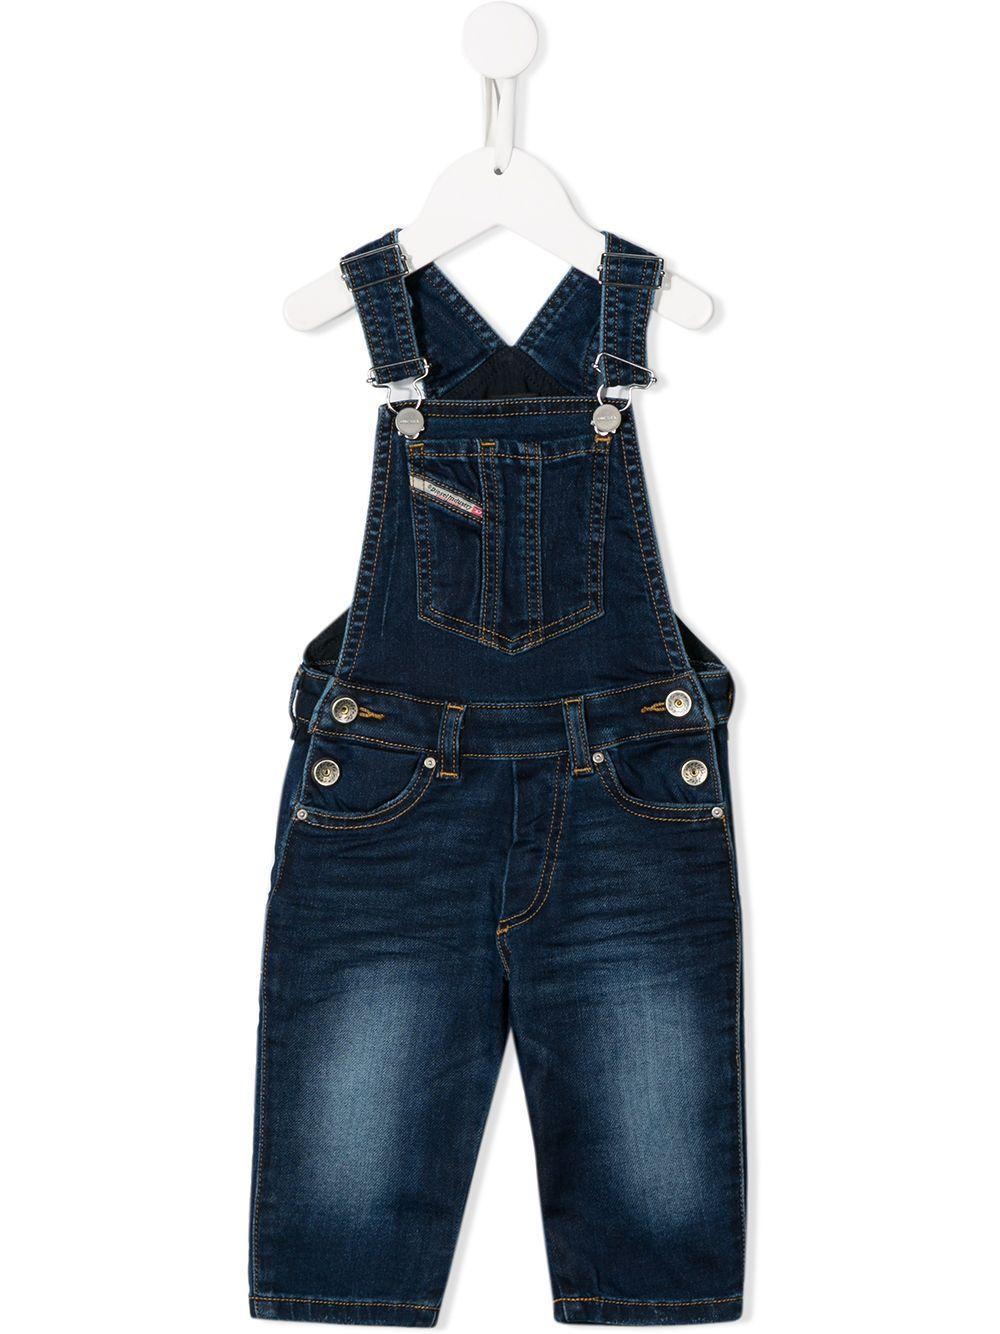 Diesel Babies Logo Dungaree Jeans In 蓝色 Modesens